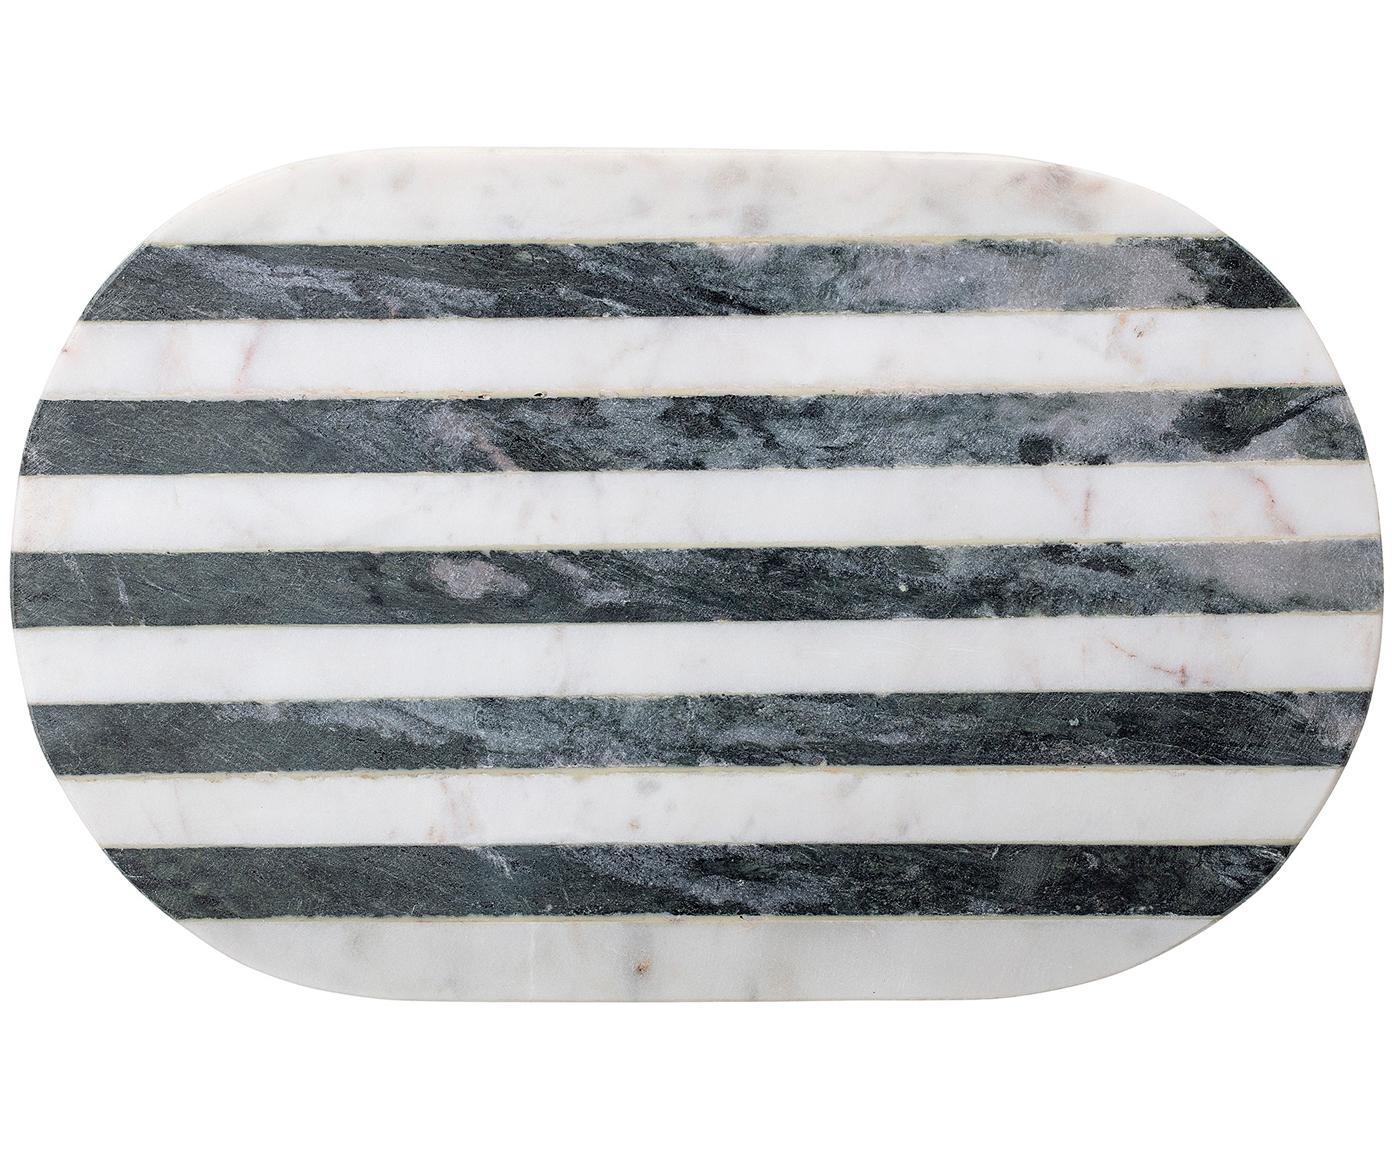 Marmor-Schneidebrett Stripes, Marmor, Schwarz, Weiß, B 37 x T 23 cm